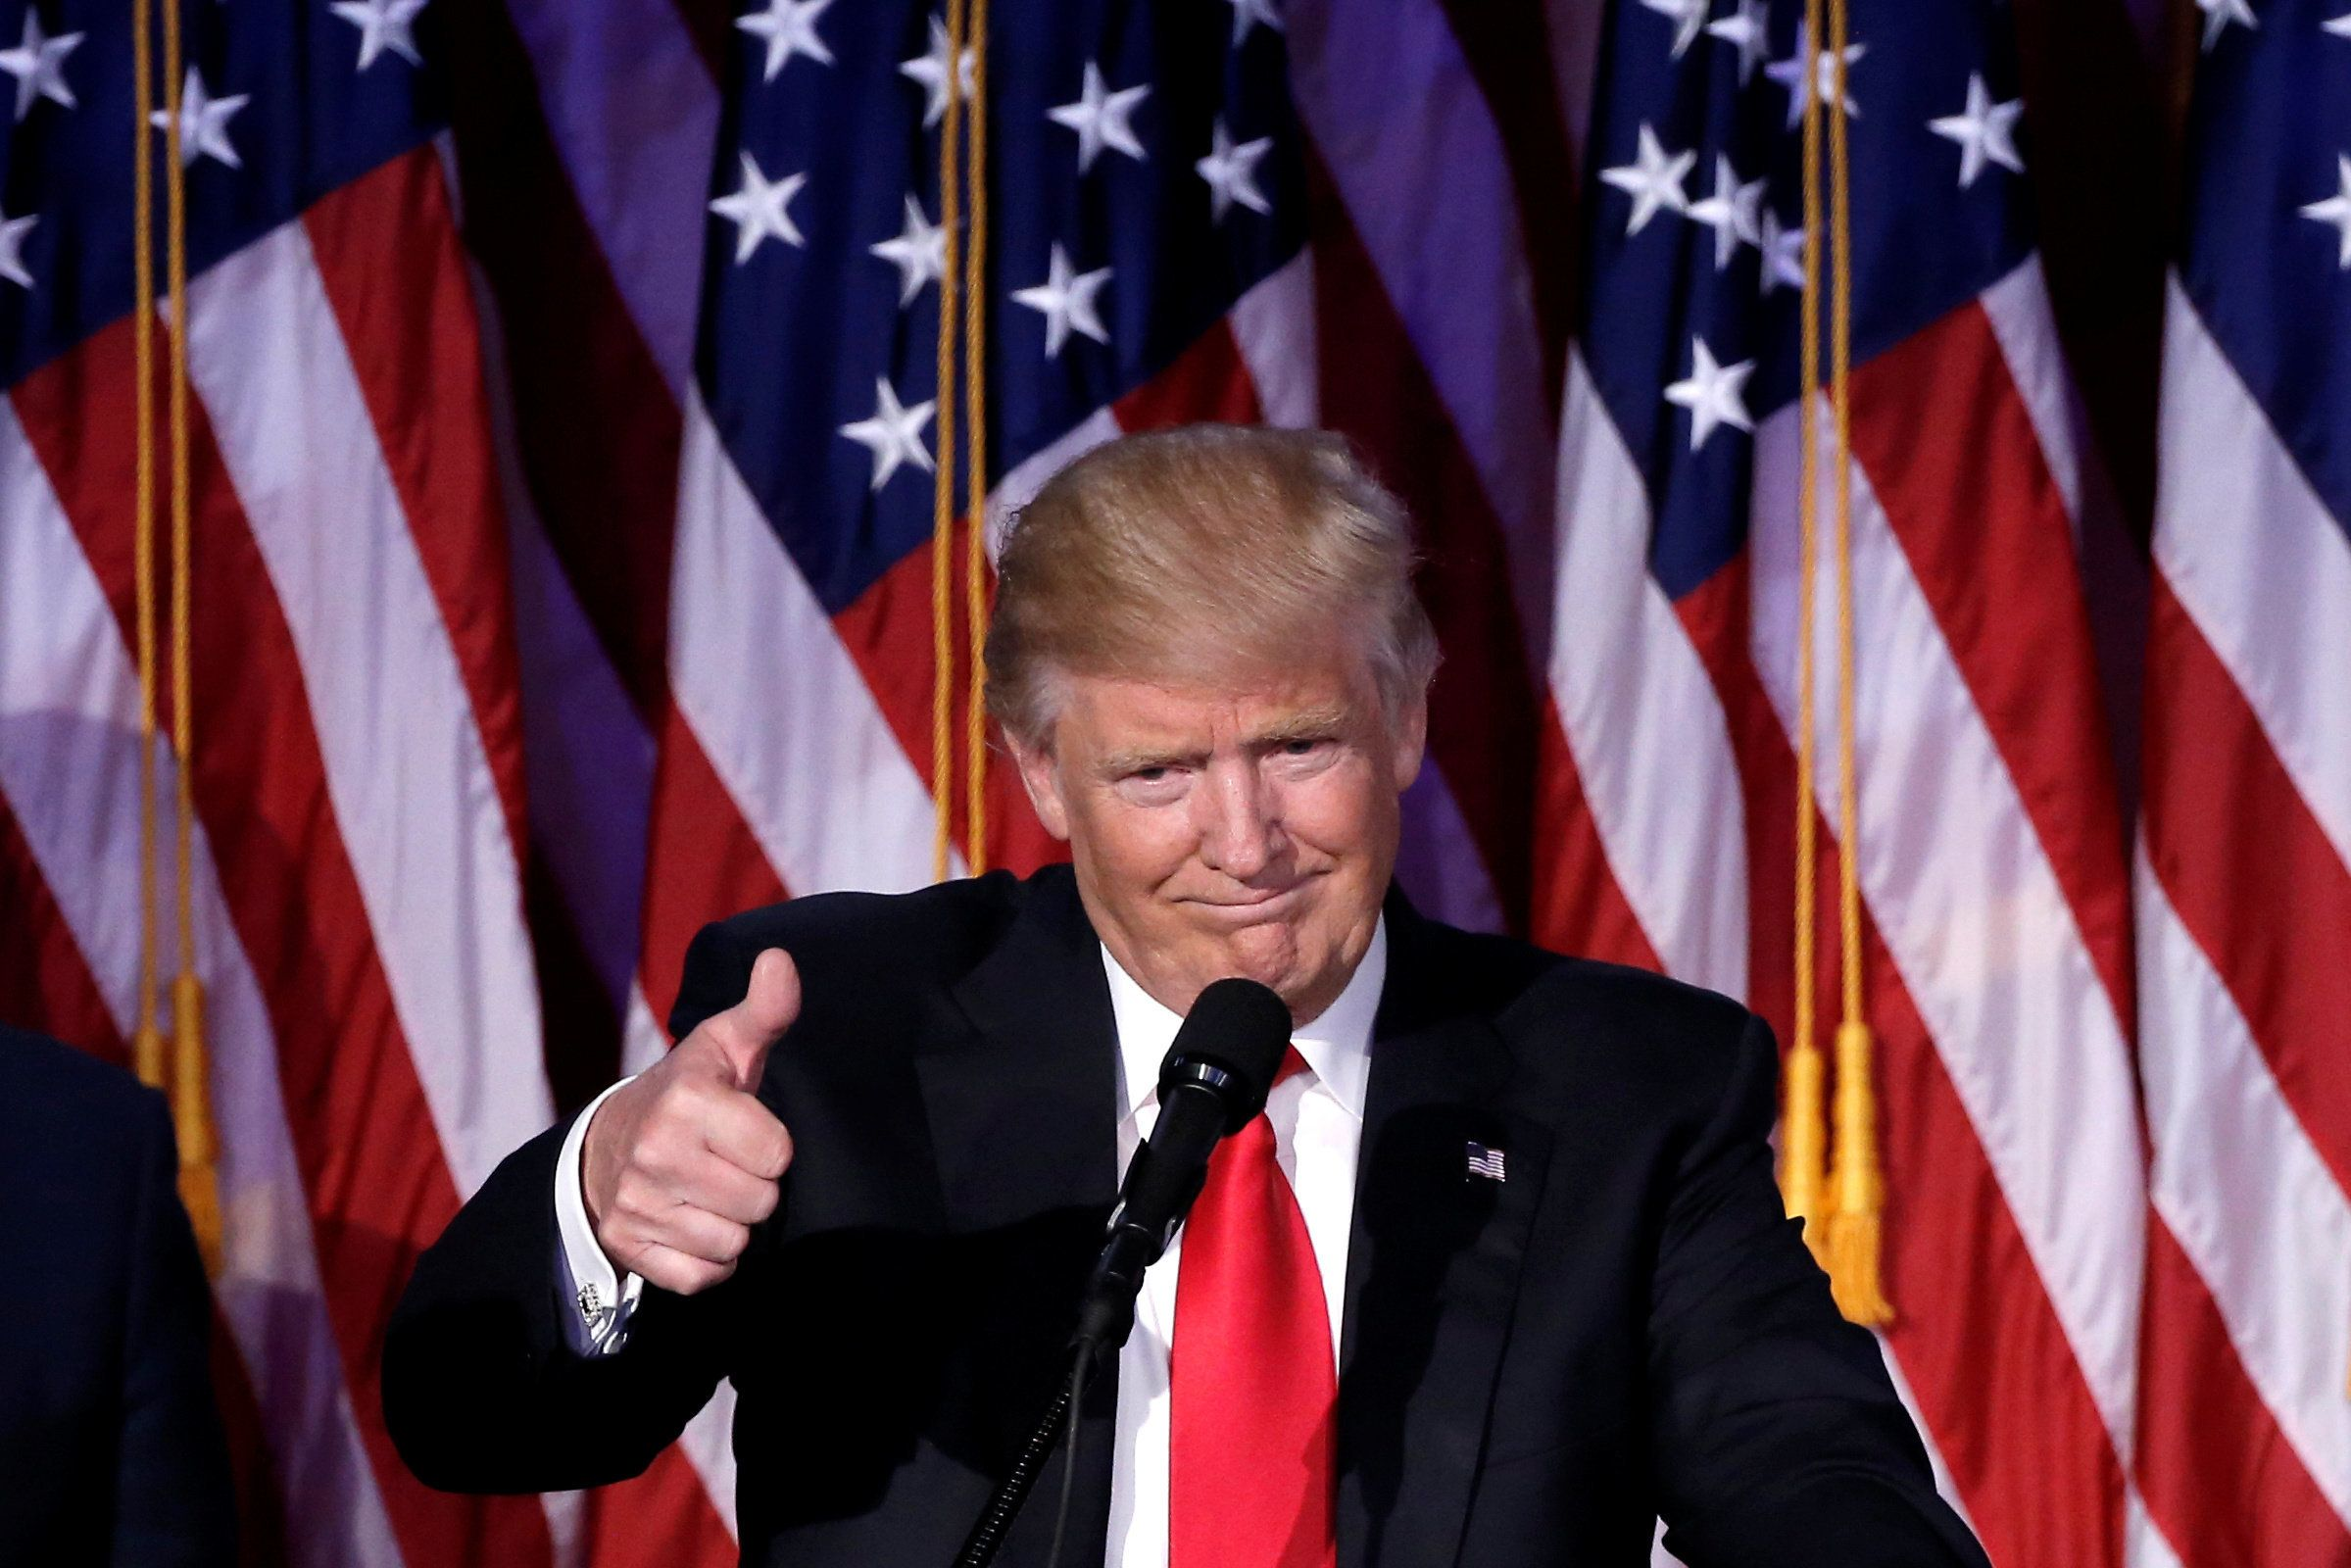 U.S. President-elect Donald Trump gestures as he speaks at election night rally in Manhattan, New York, U.S., November 9, 2016. REUTERS/Mike Segar